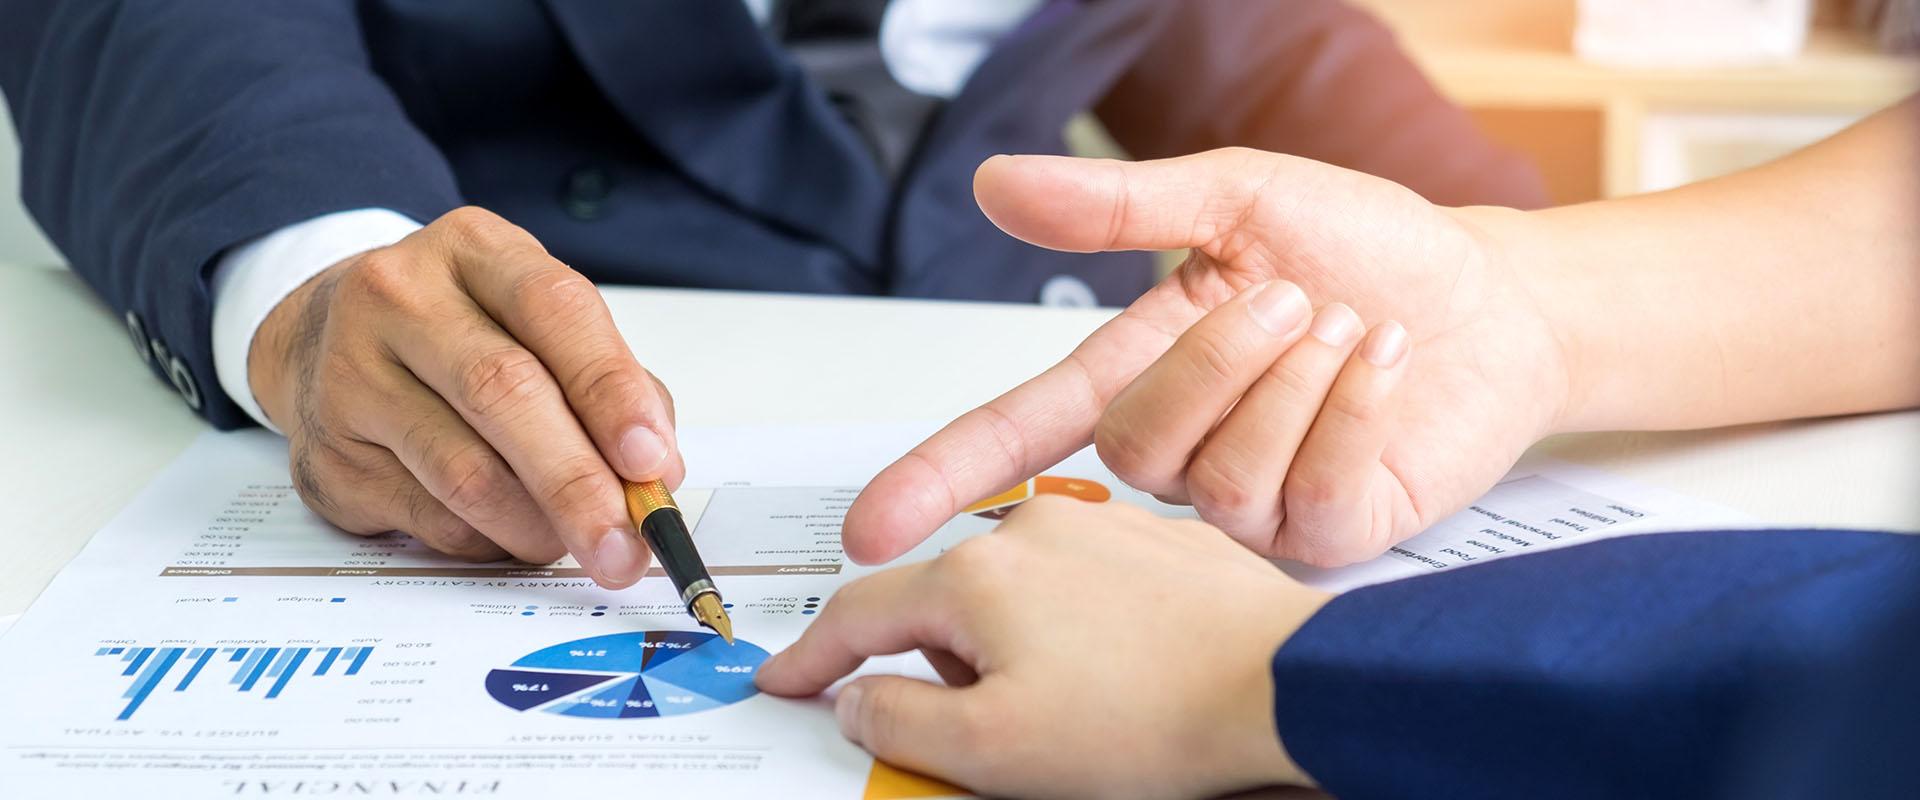 H & H Associates London's premier chartered accountancy